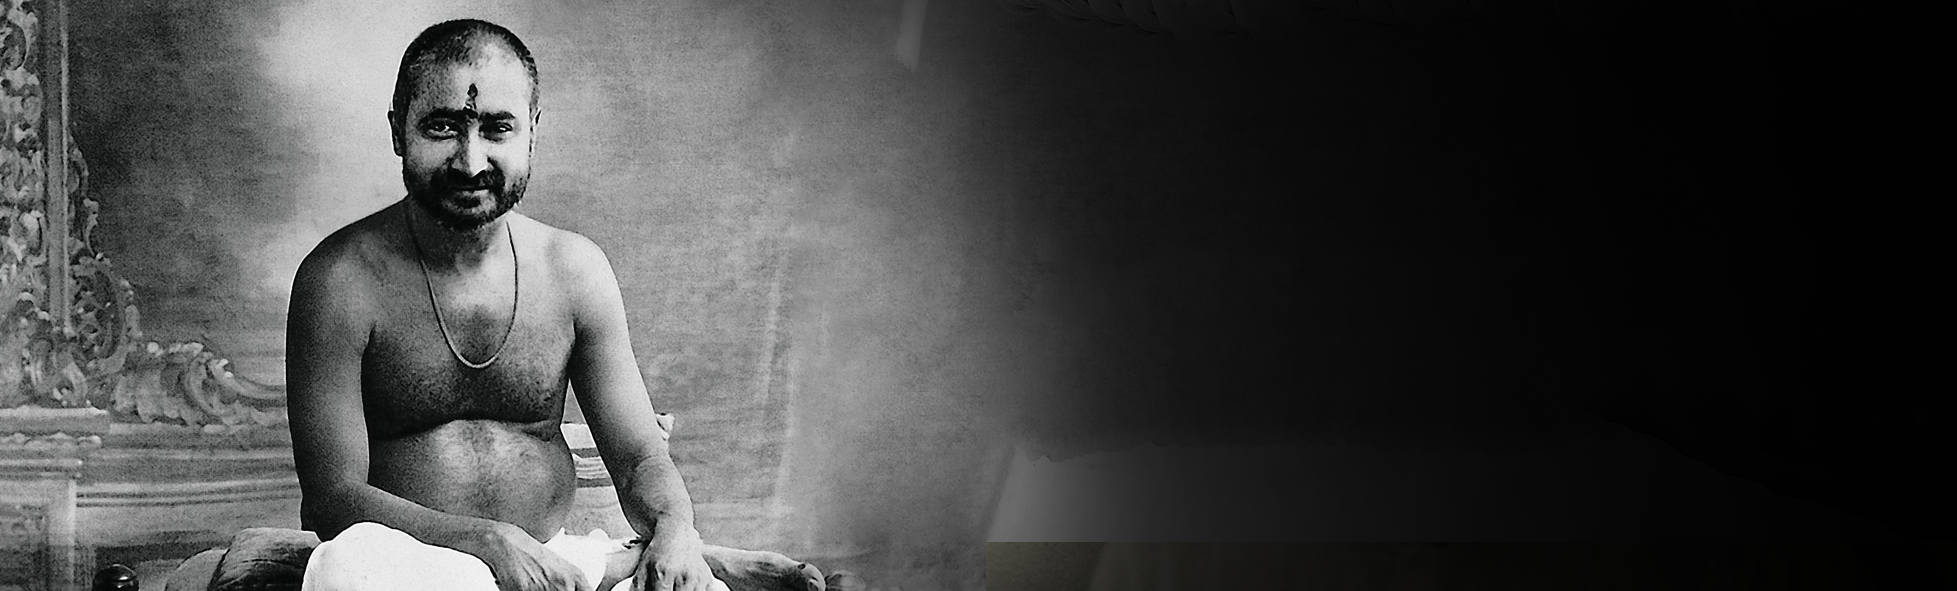 NISARGADATTA MAHARAJ : THE EXPERIENCE OF NOTHINGNESS